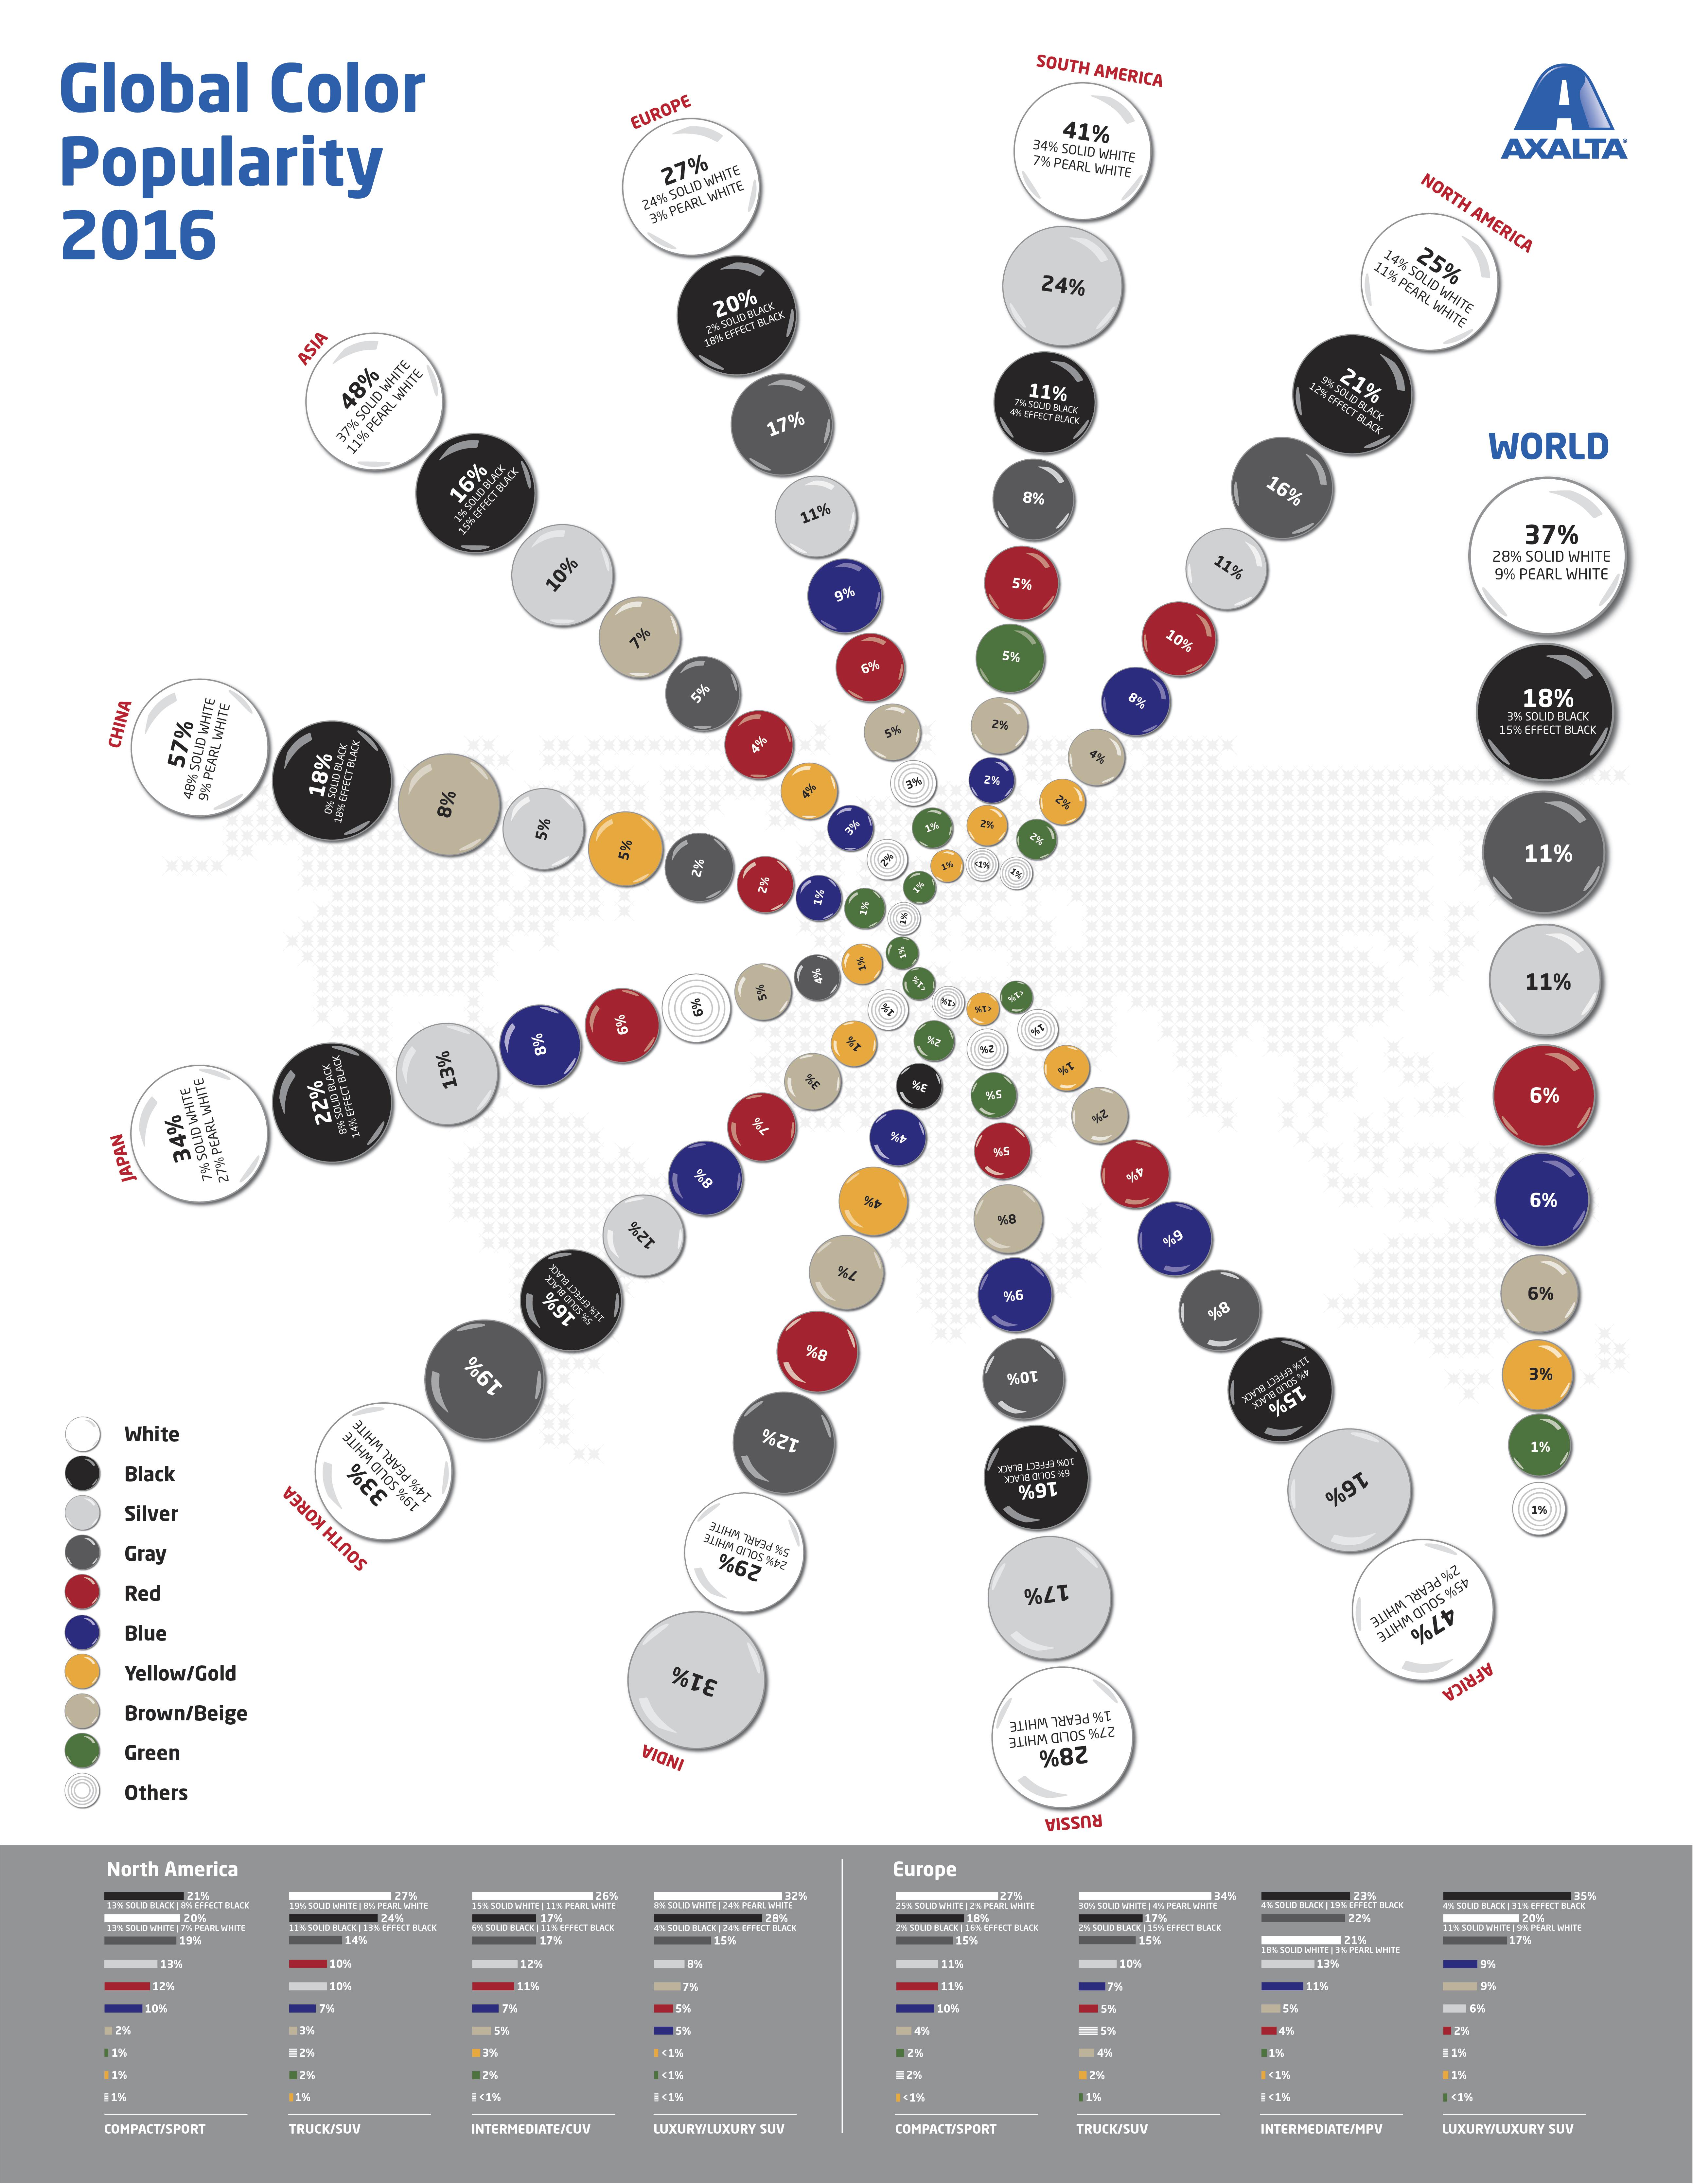 Axalta Coating Systems Ltd. (NYSE:AXTA) Under Analyst Spotlight